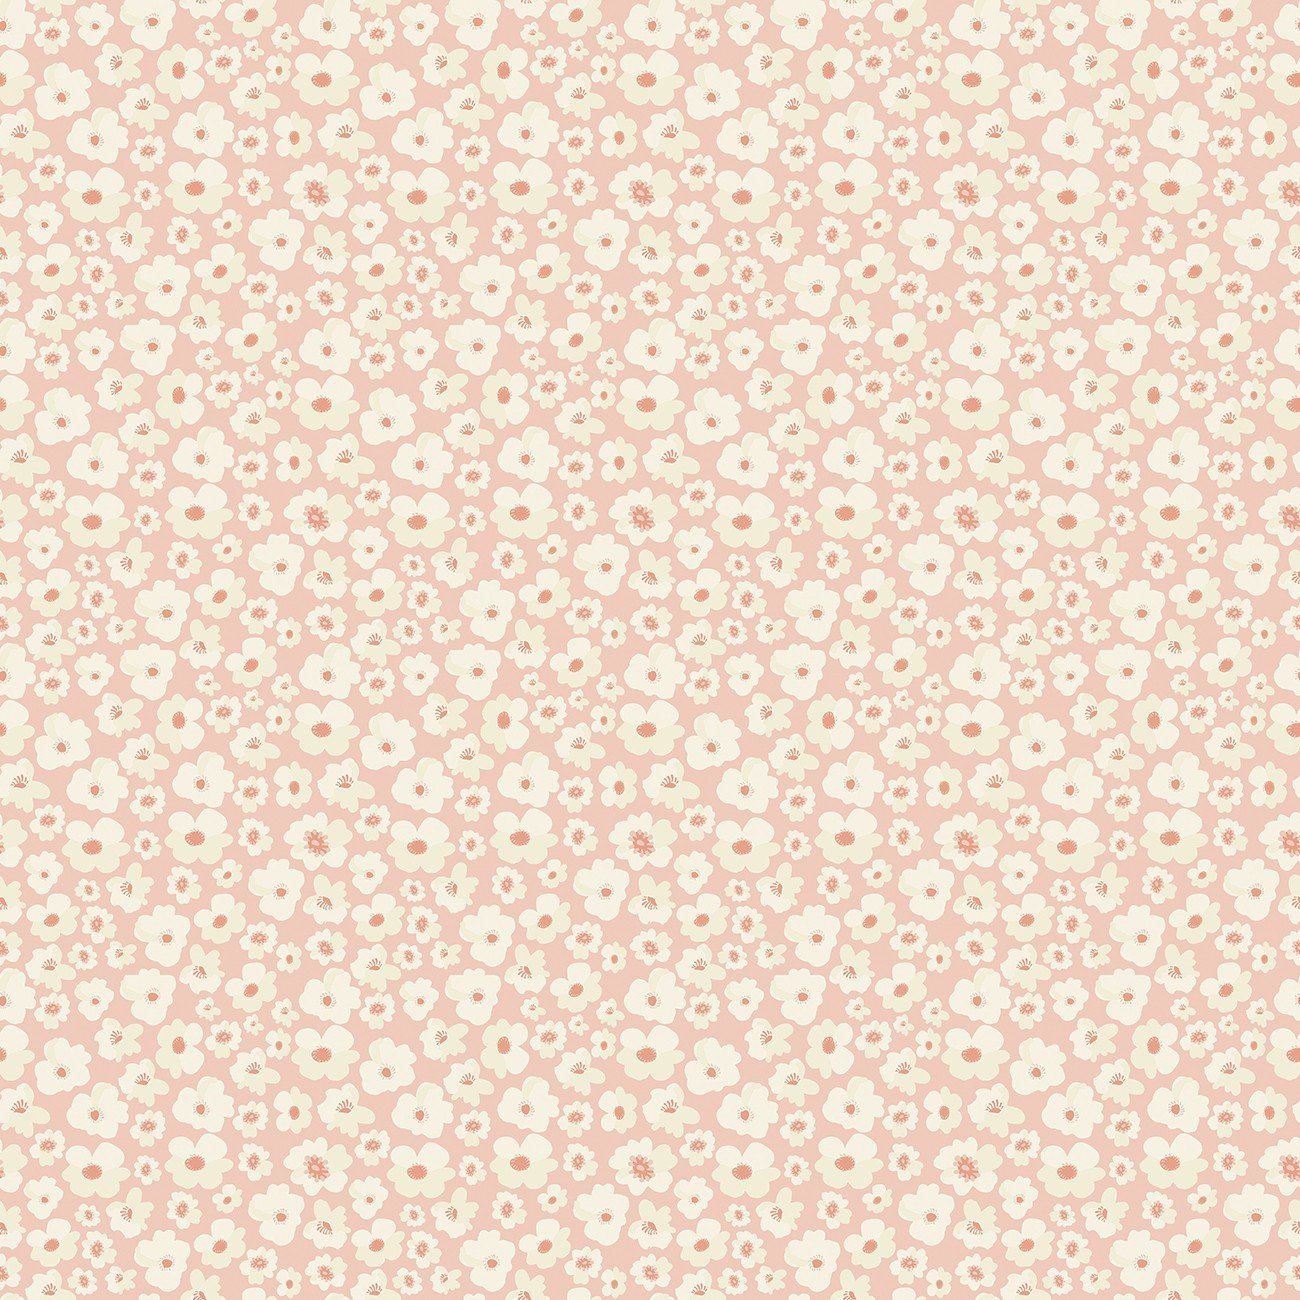 Ava Kate Flowers Blush